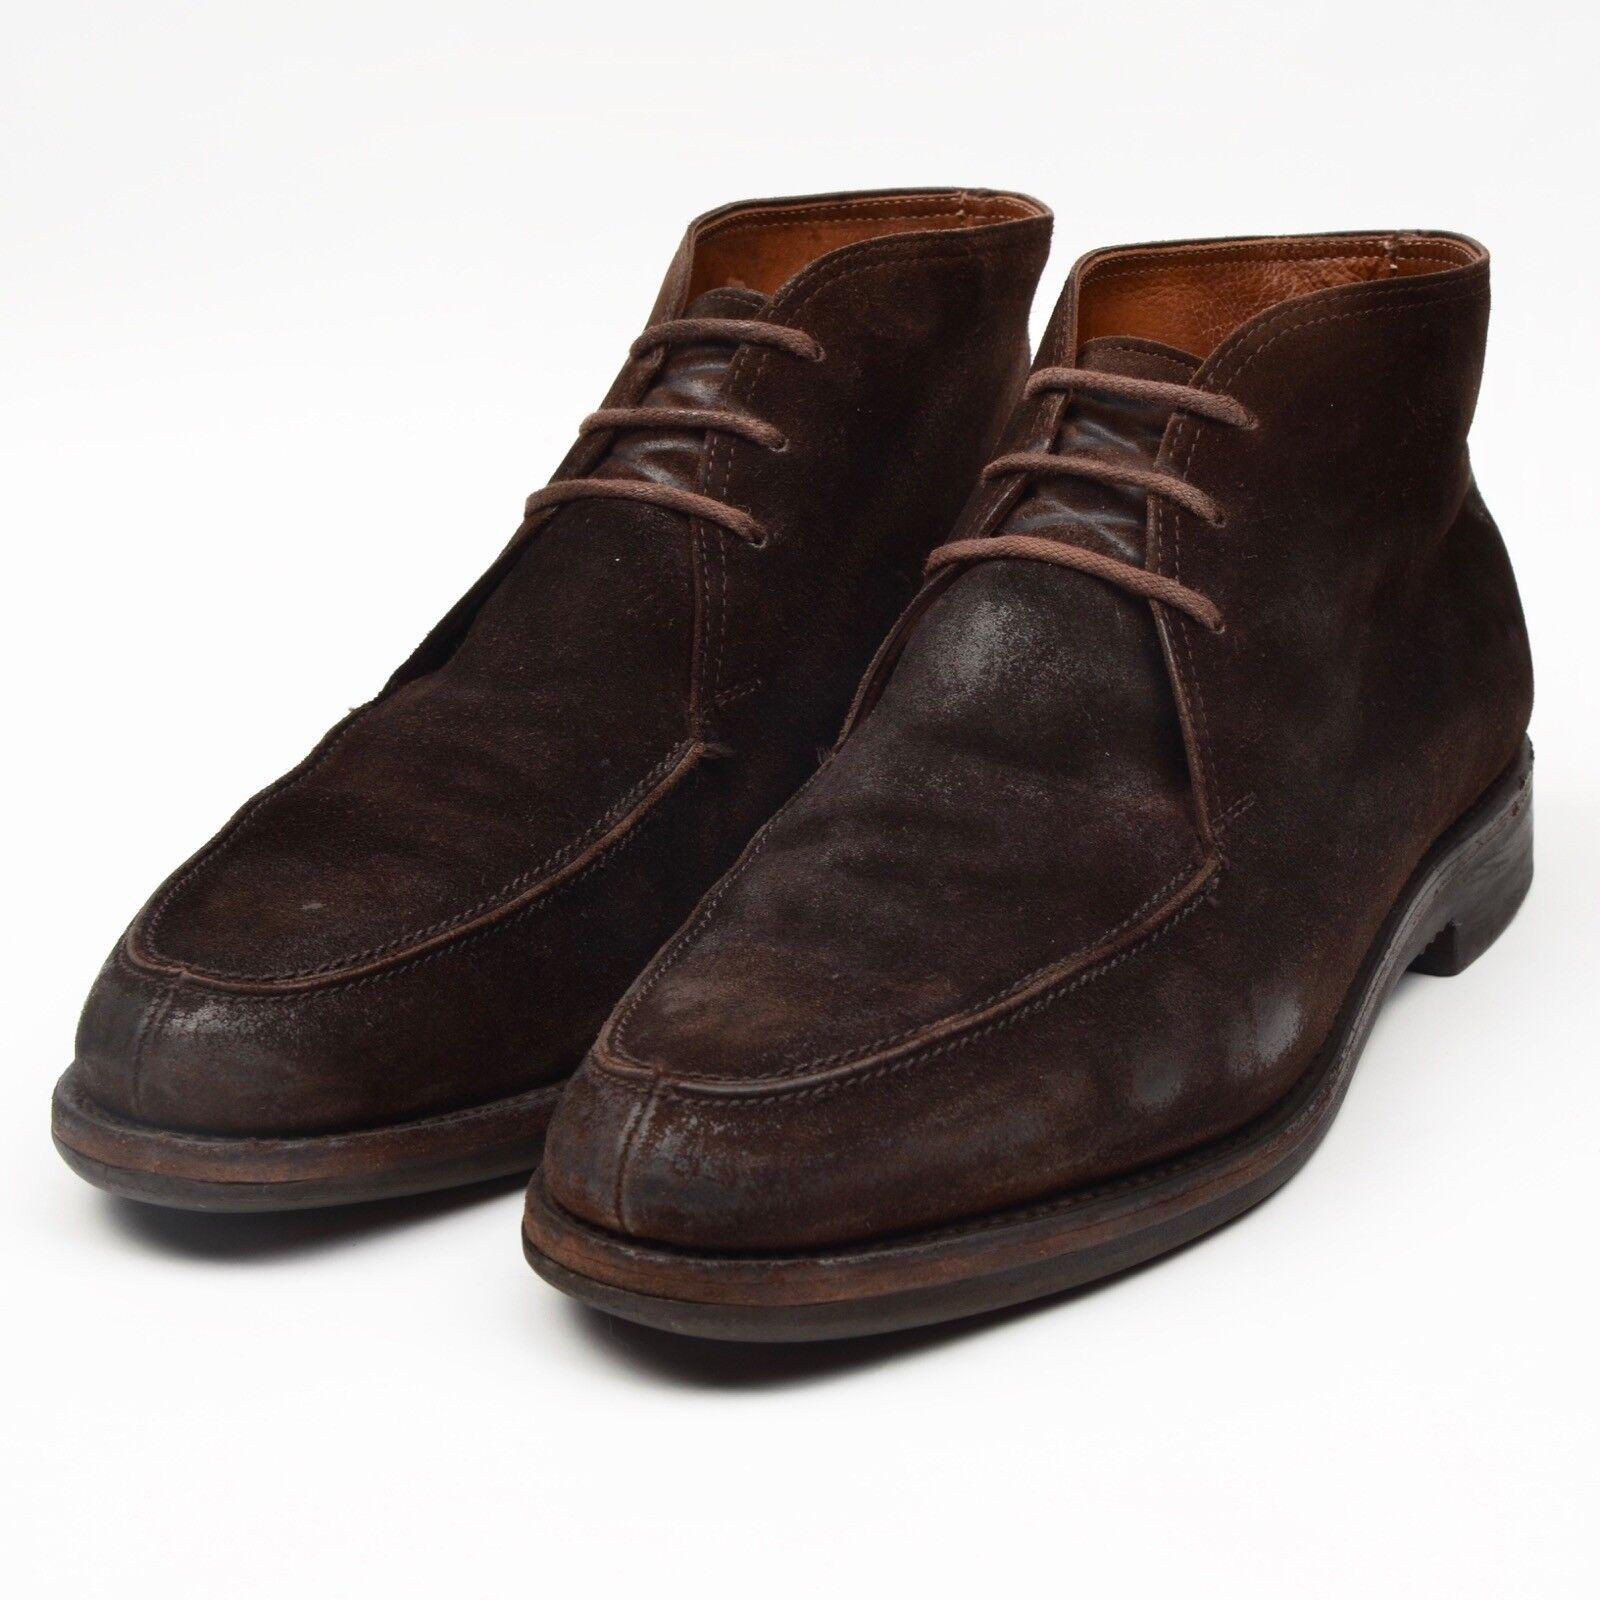 Baldessarini Hugo Boss Stiefel 8 Stiefel Crockett Jones Gr 8 Stiefel E Wildleder Suede Braun c29aaa